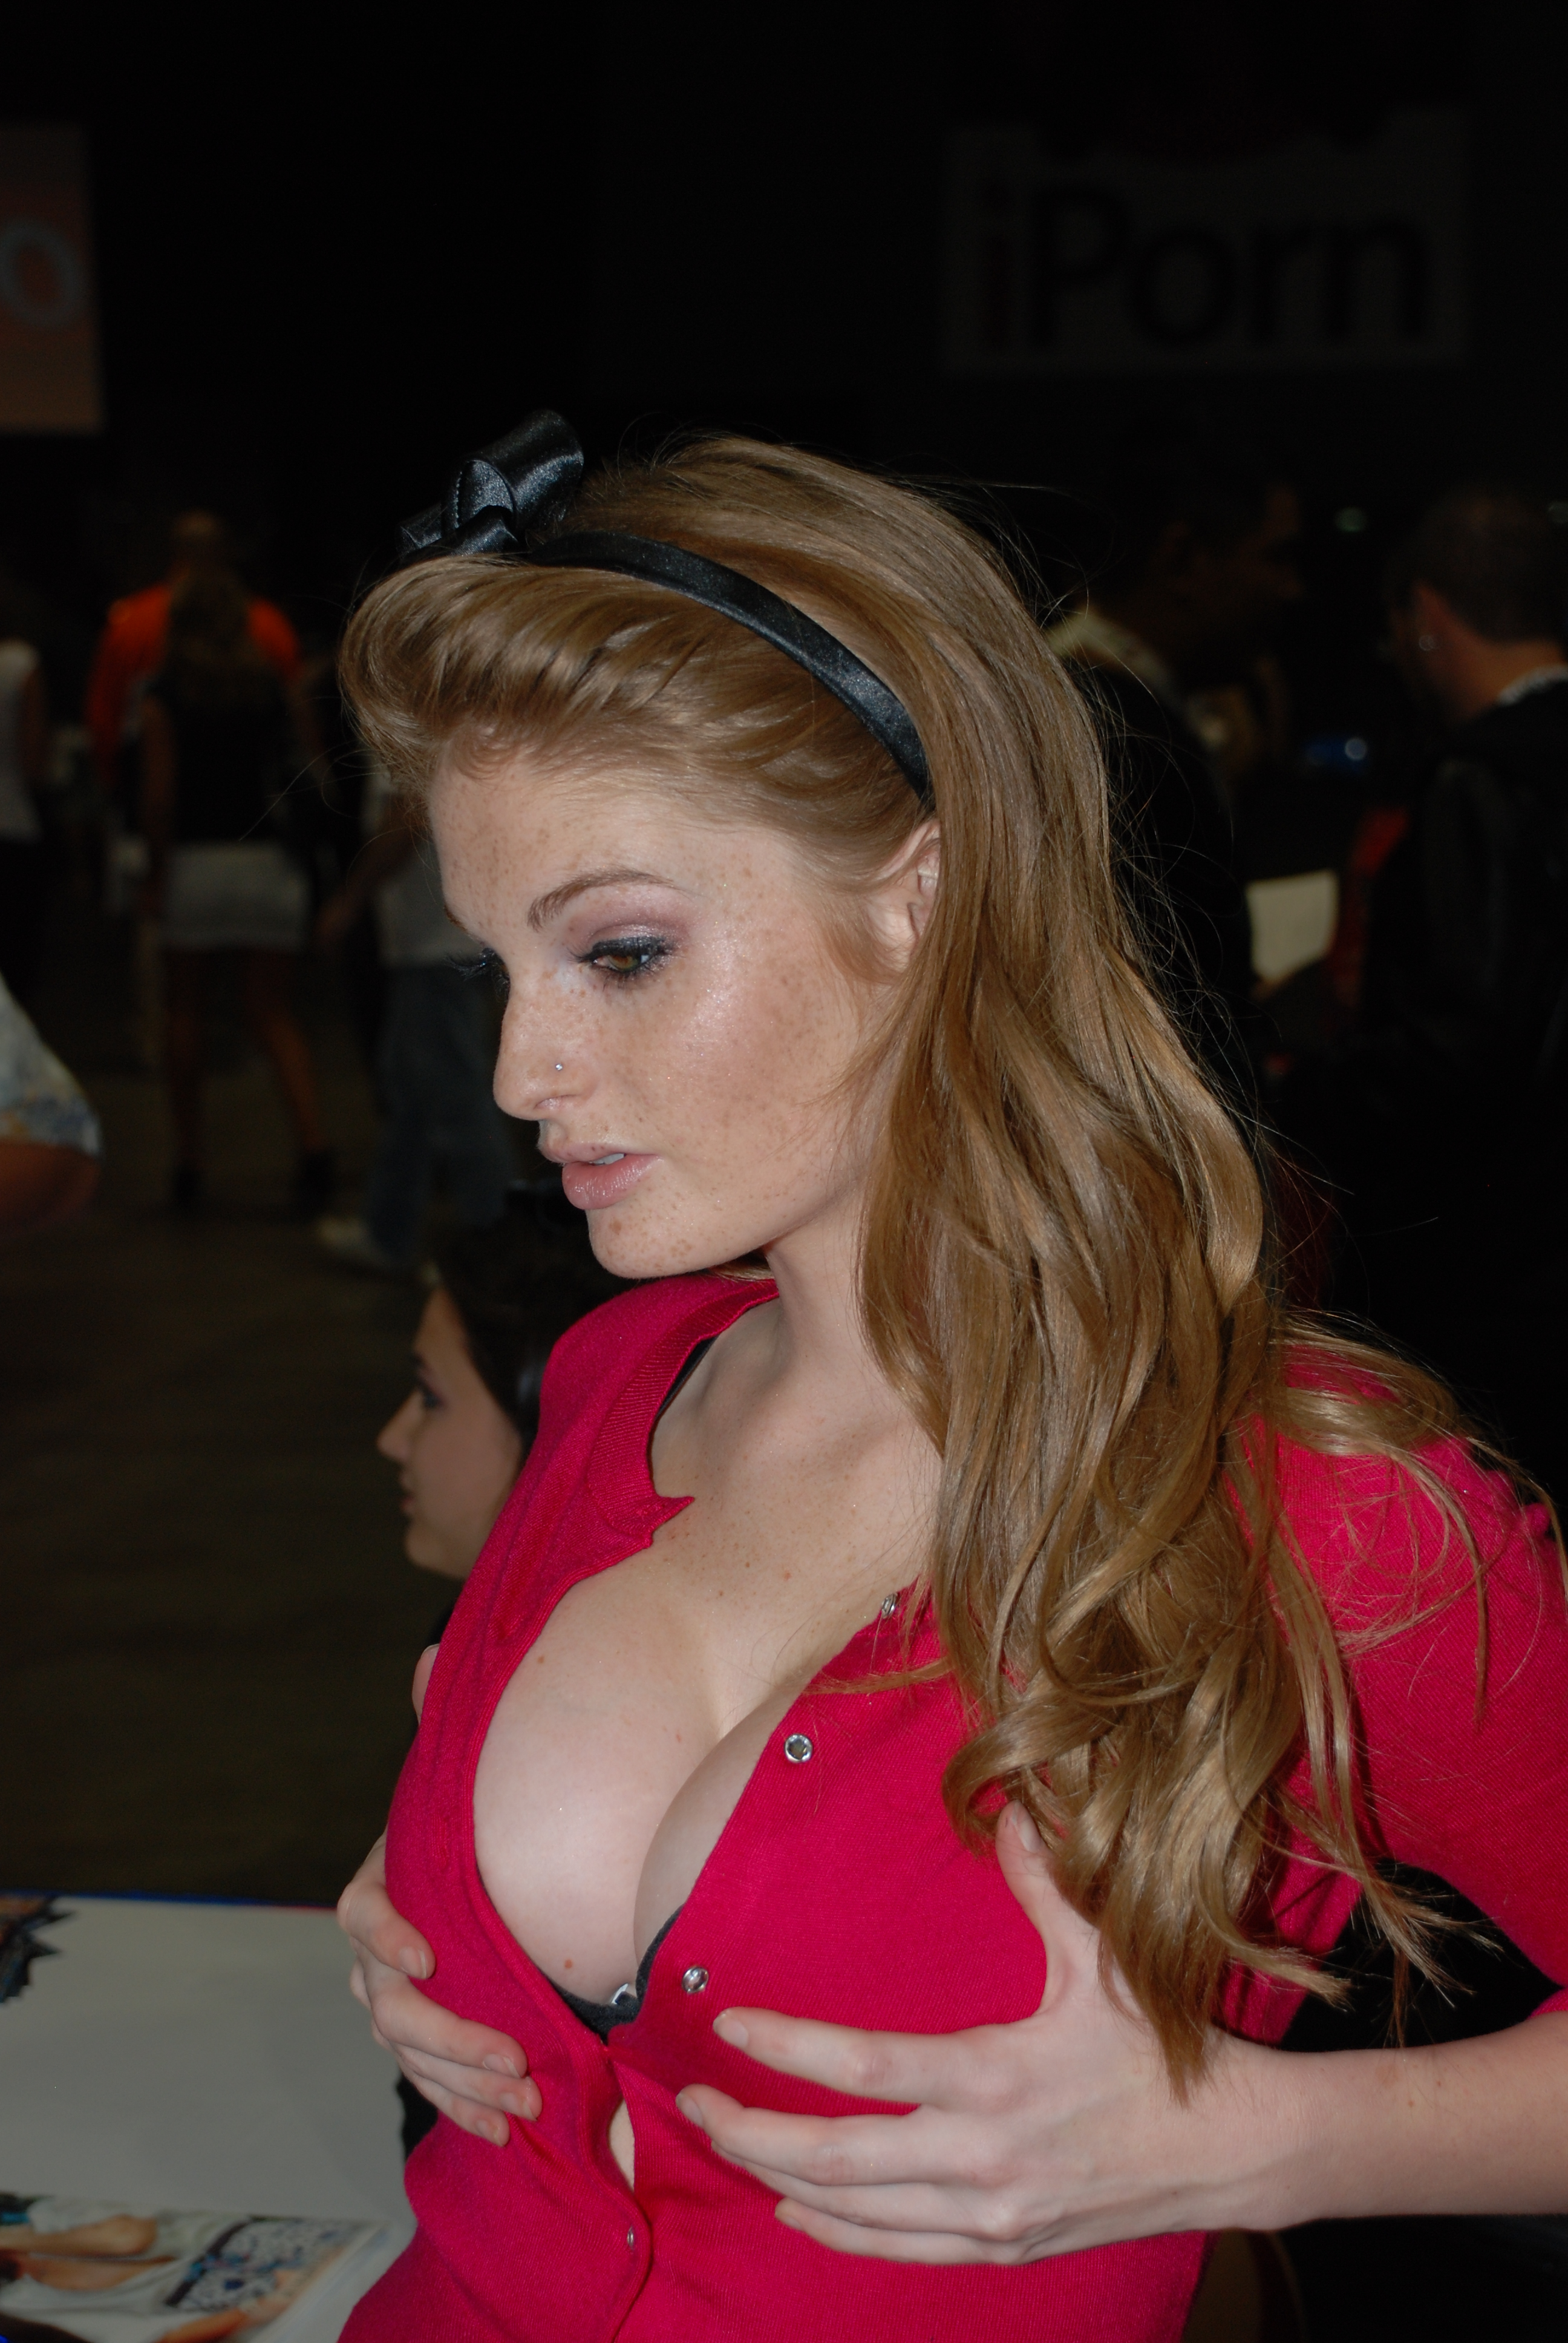 File:Faye Reagan Erotica Los Angeles 2009 (3).jpg - Wikimedia Commons